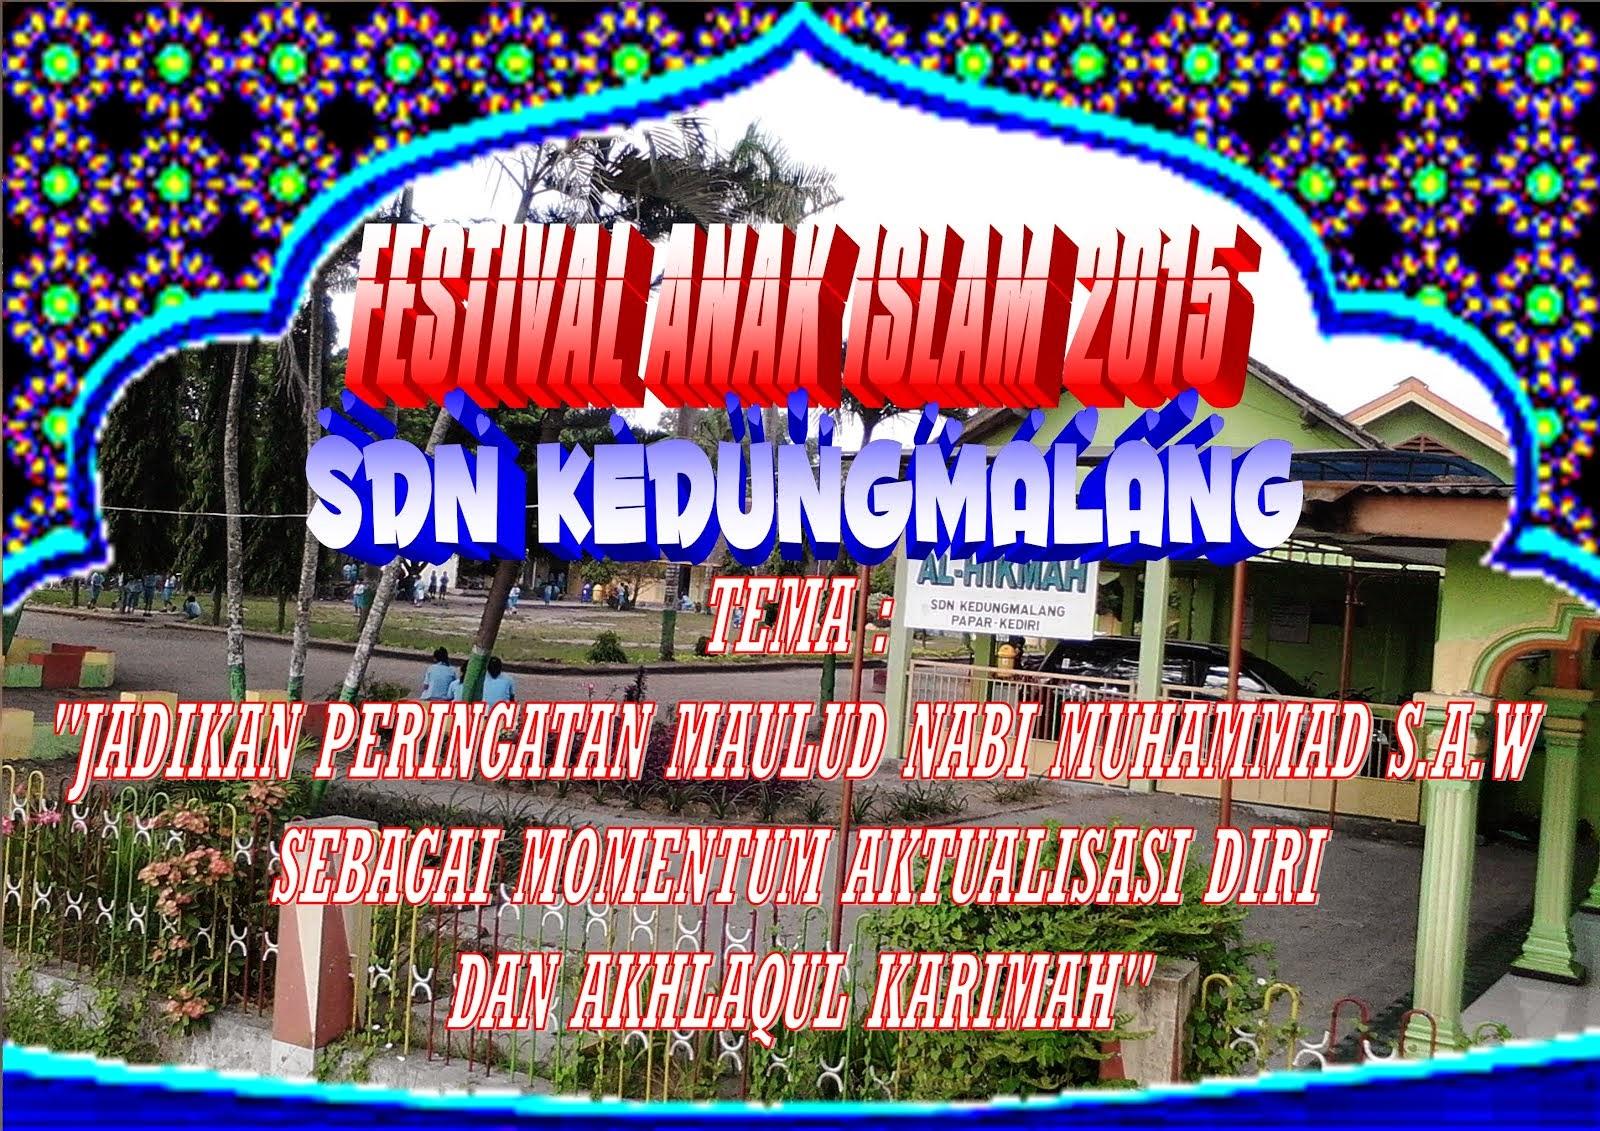 FESTIVAL ANAK ISLAM 2015